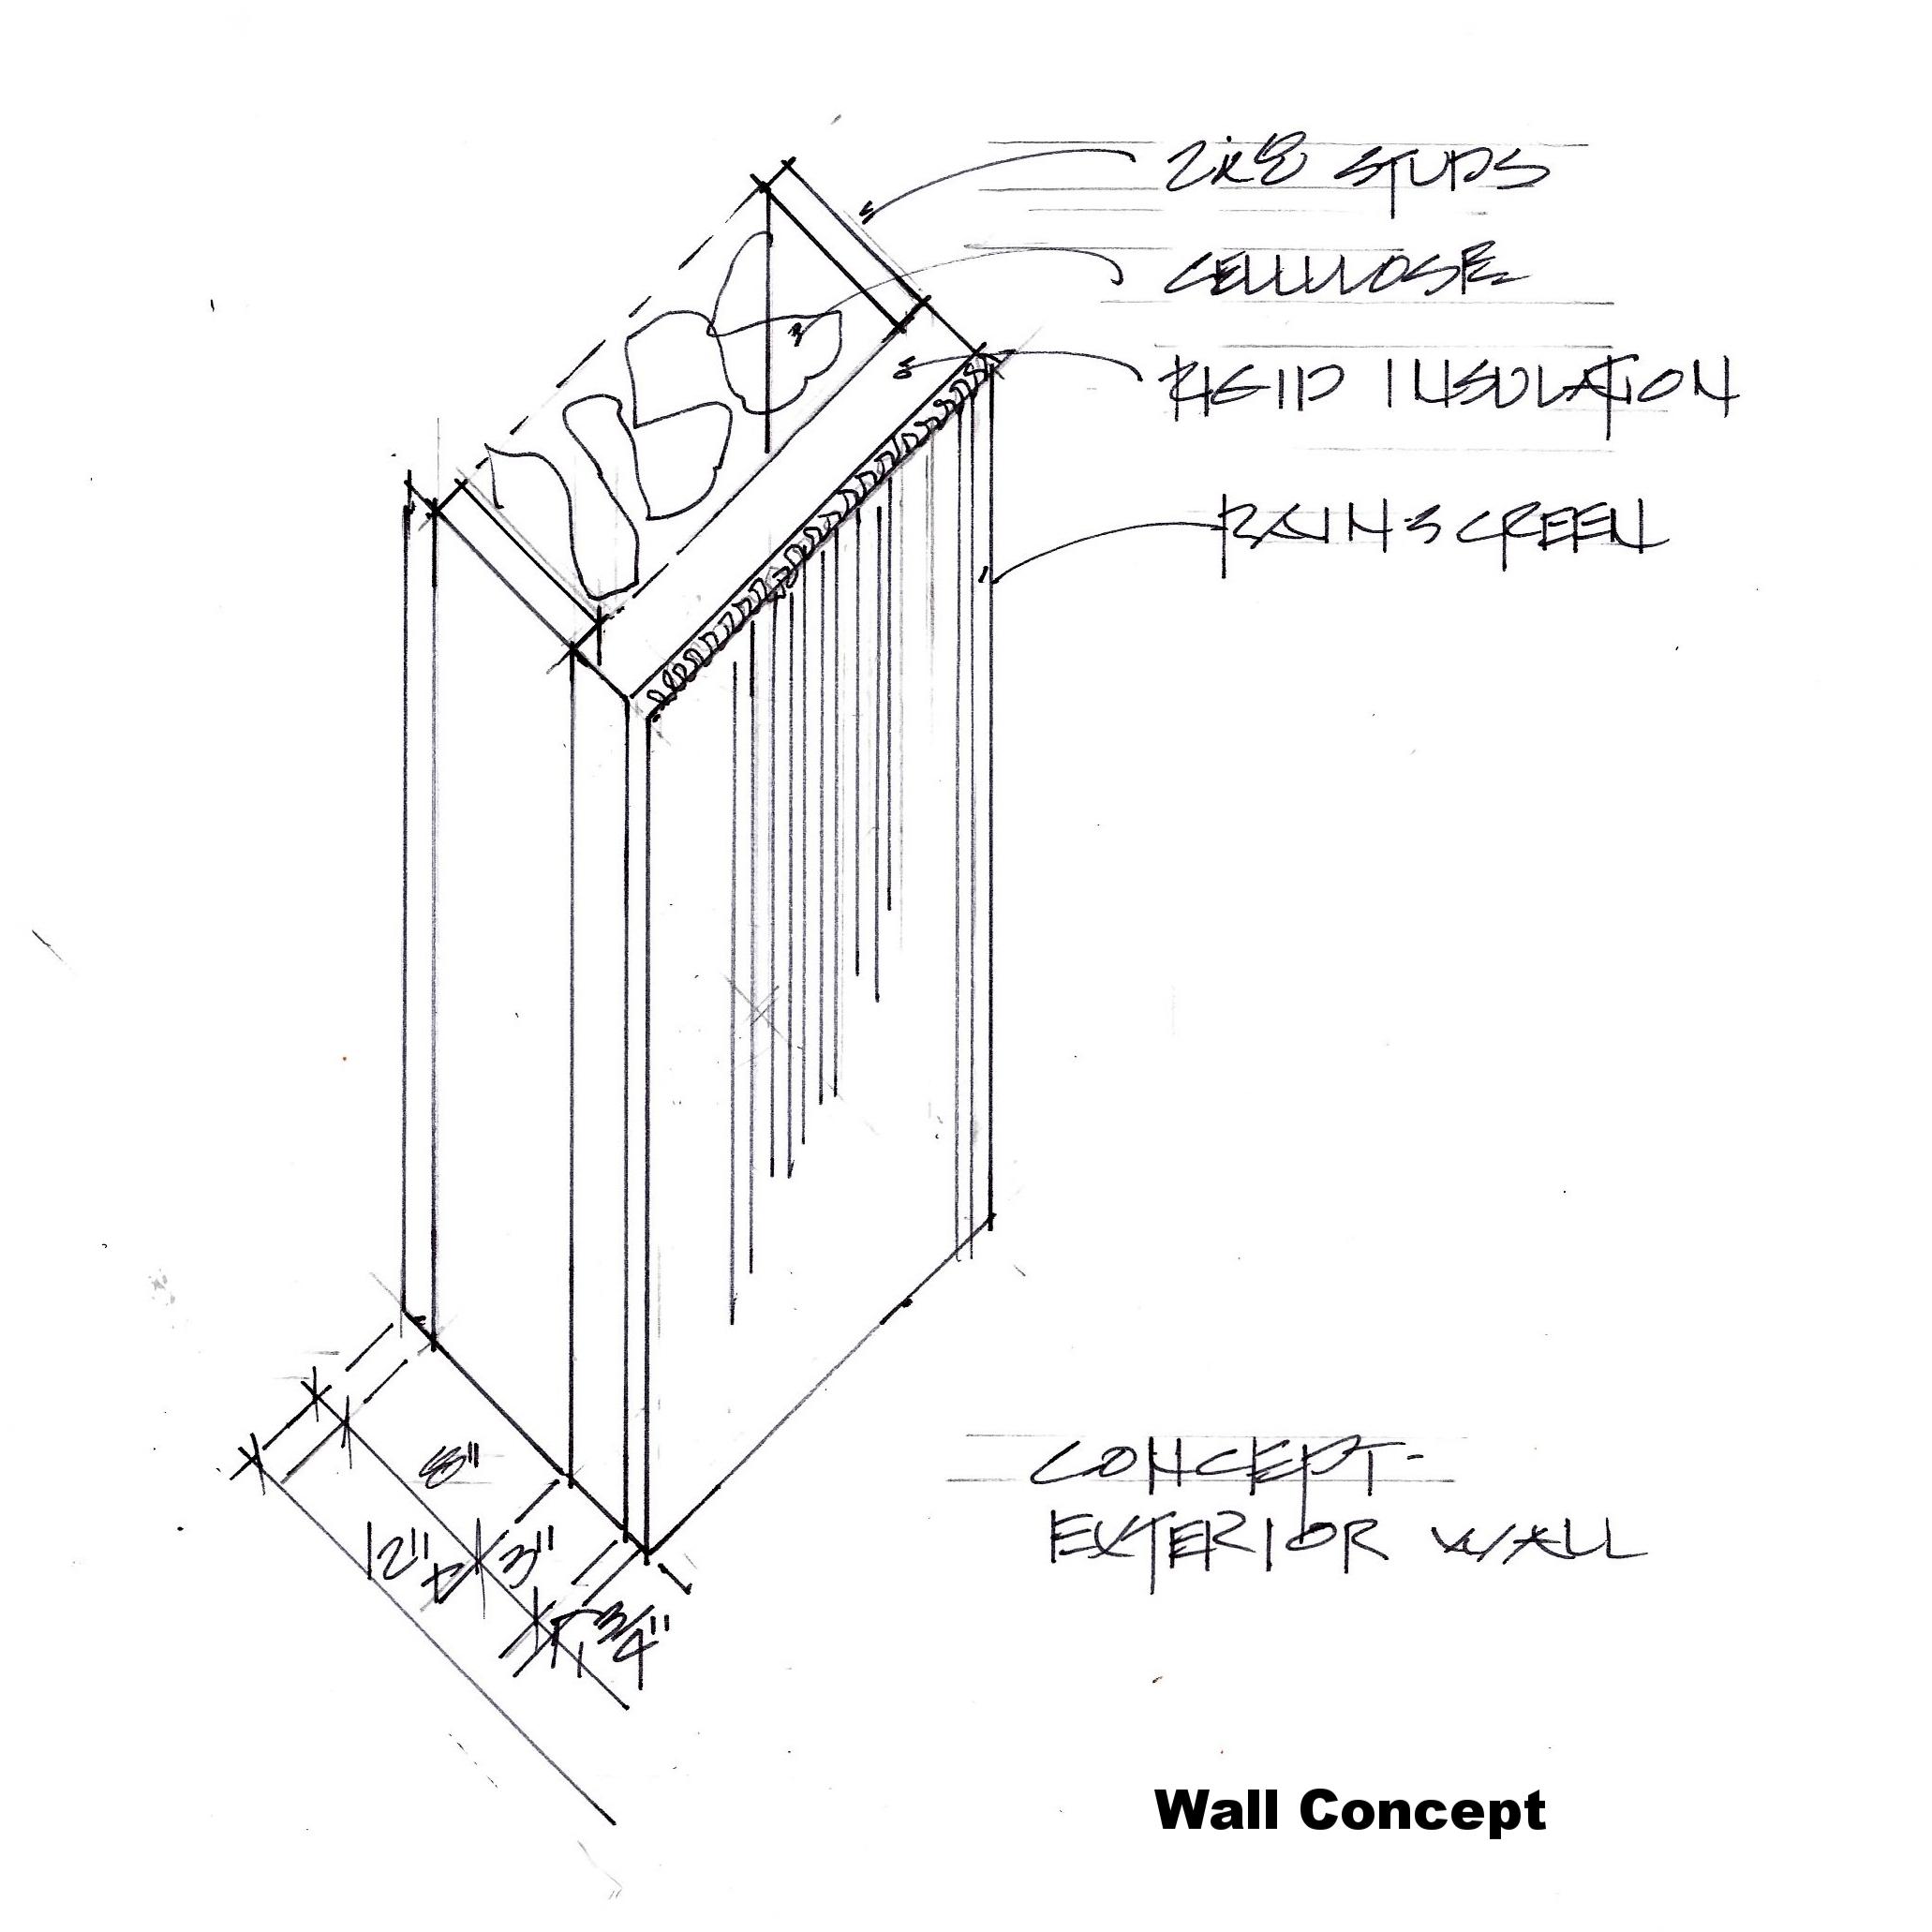 1-wall concept.JPG